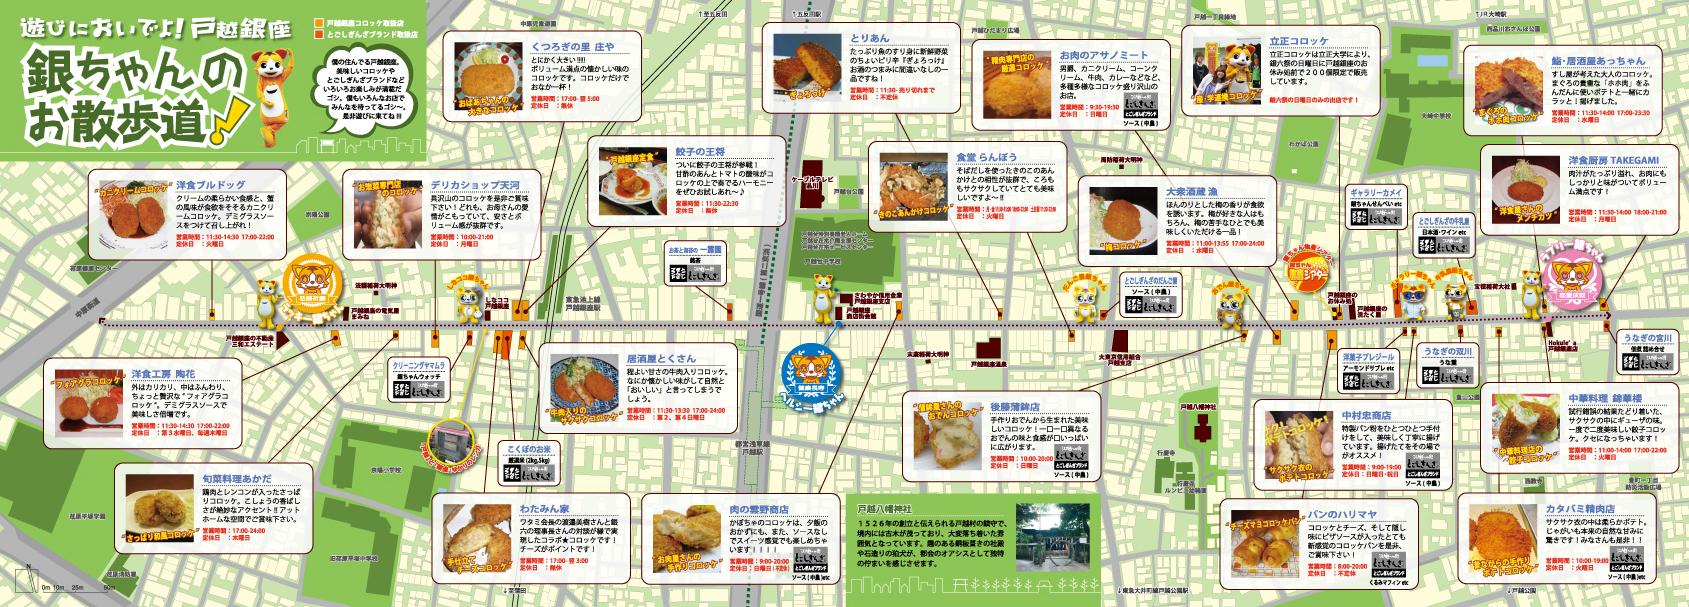 http://dogplanet.sakura.ne.jp/spanky/asoura.jpg